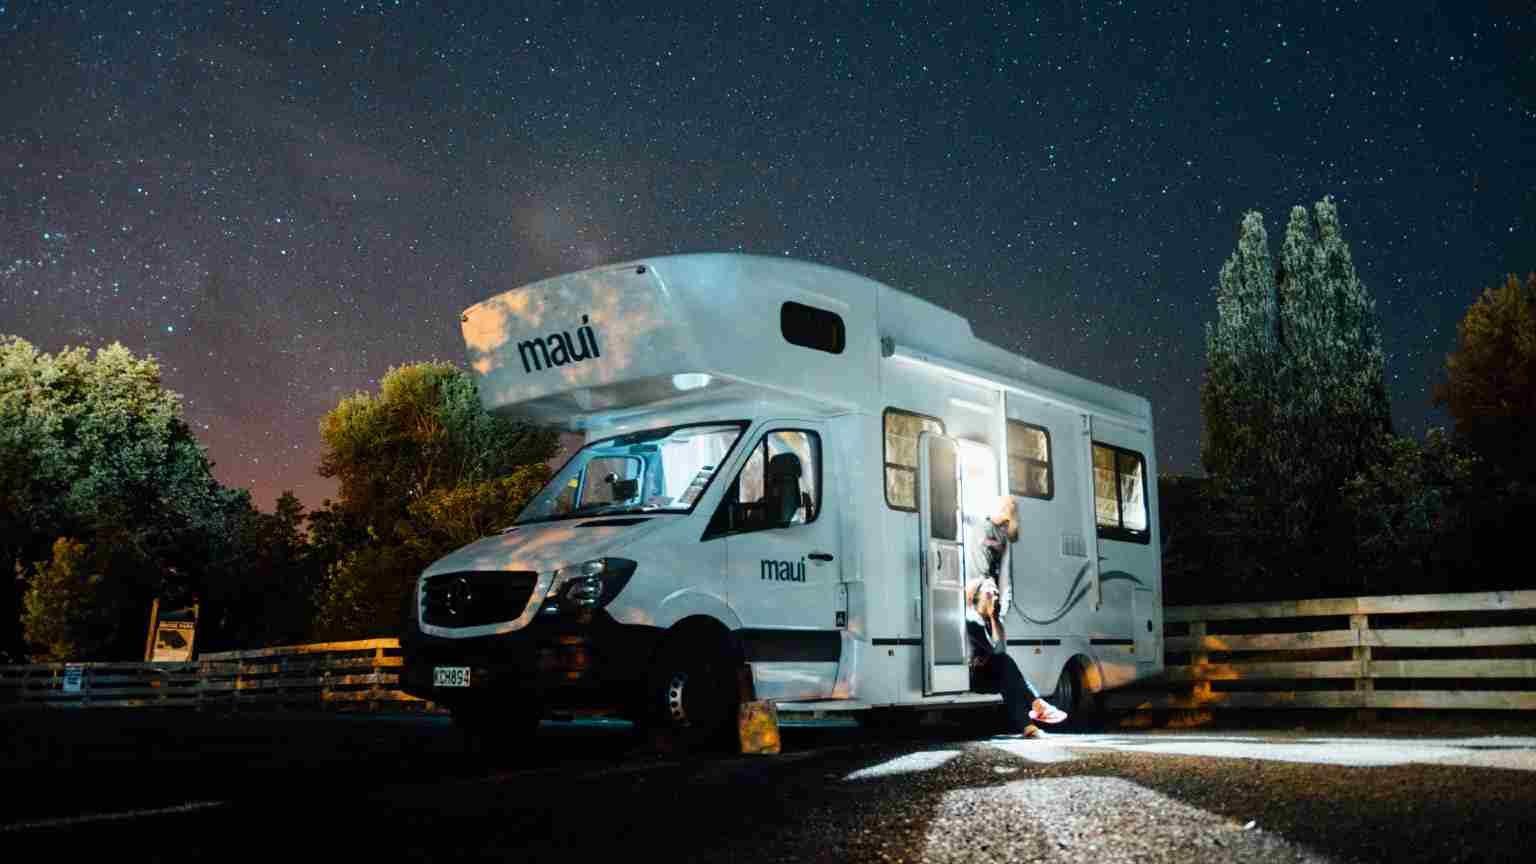 a campervan in a caravan park